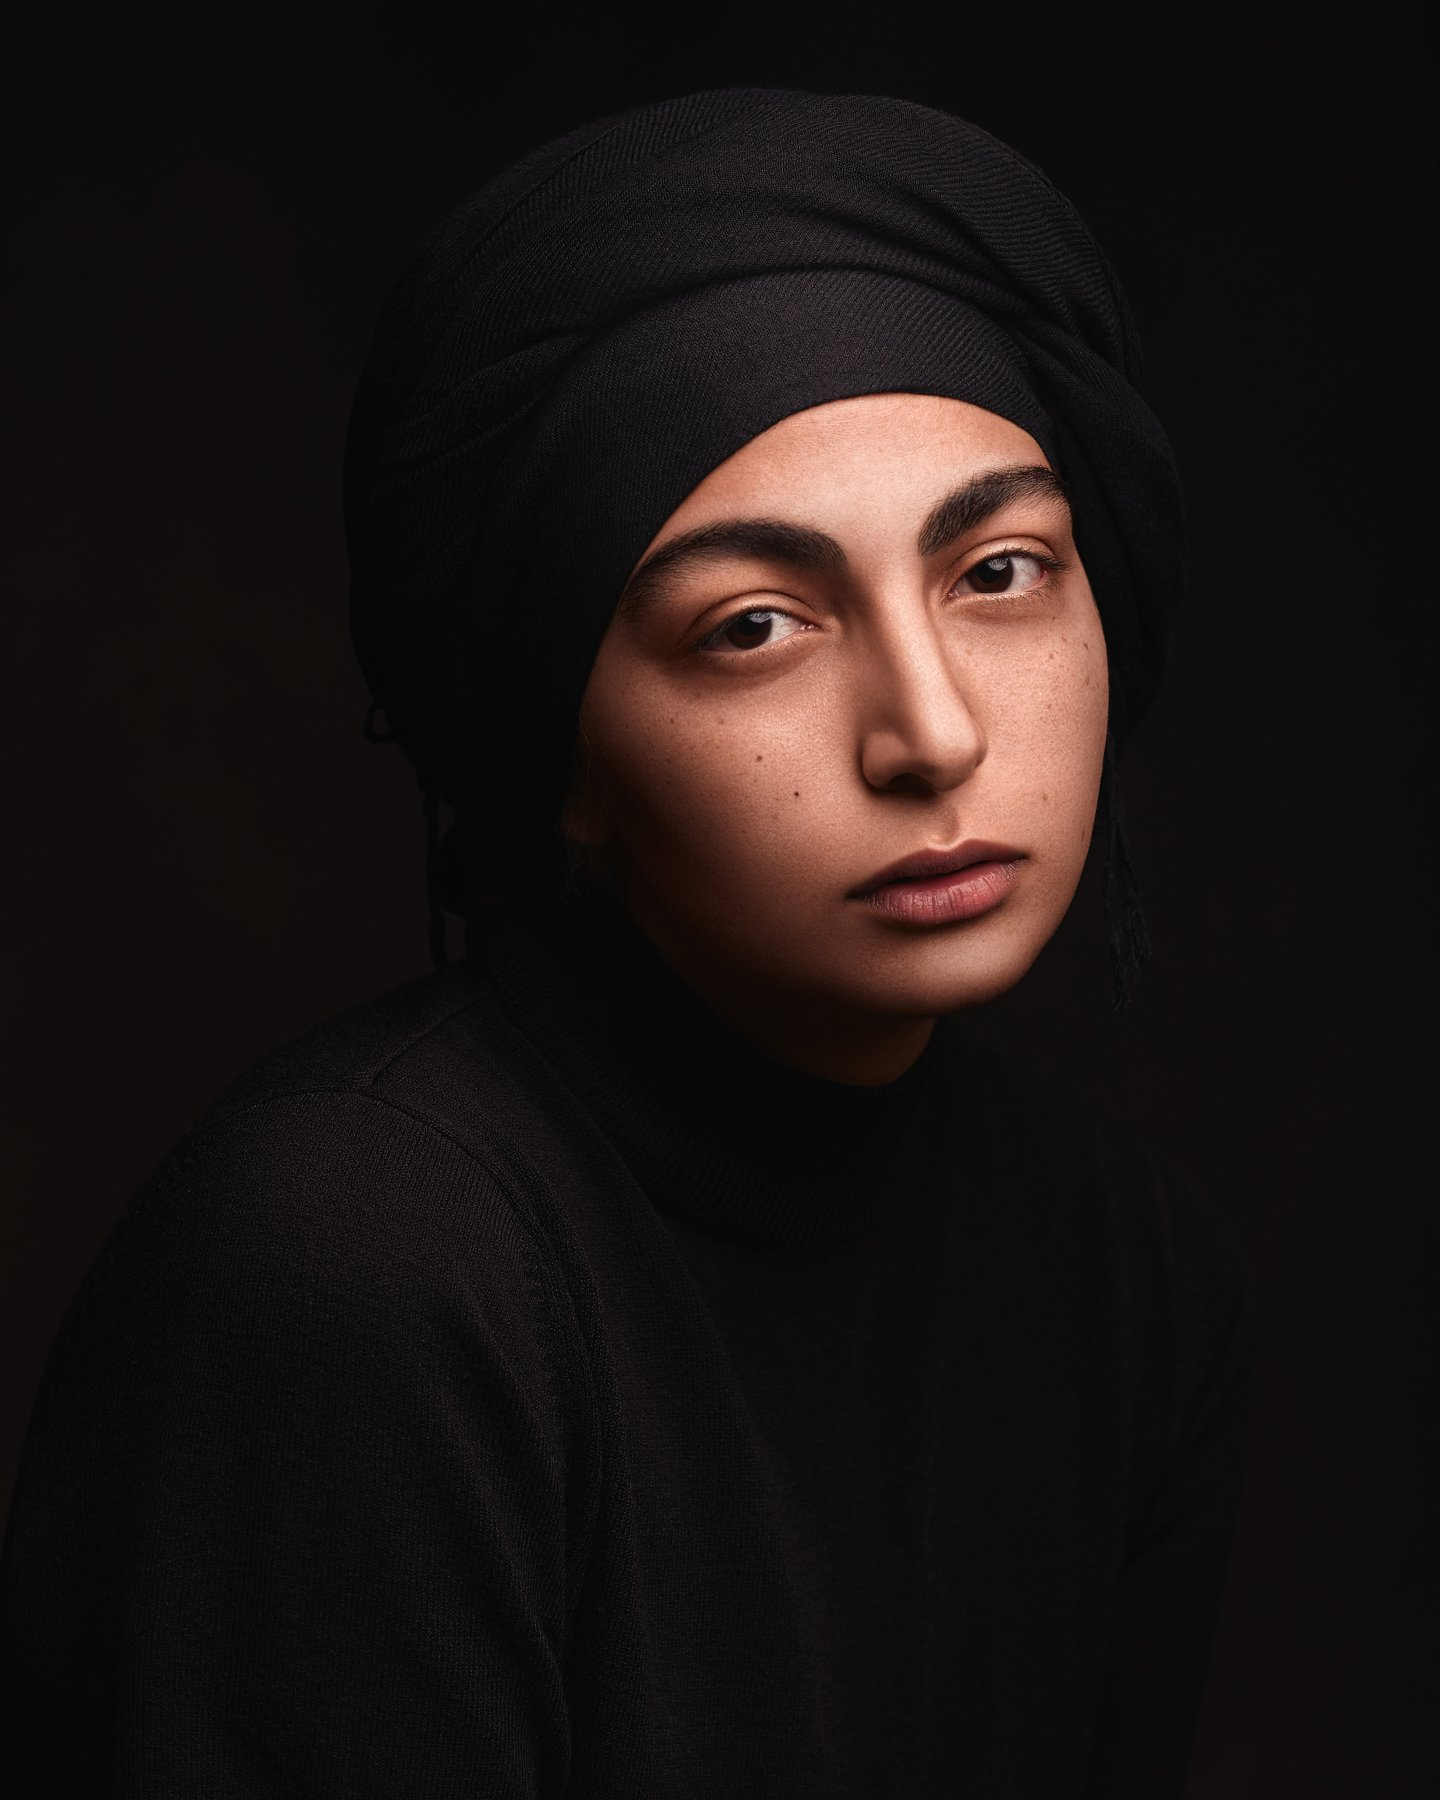 portrait, girl, beauty, eyes, lips, beautiful, studio, glamour, cute, pretty, style, eye, model, face, makeup, young, skin, colorful, colourful, headshoot, mahdan, mahdanalizadeh, MahDan Alizadeh